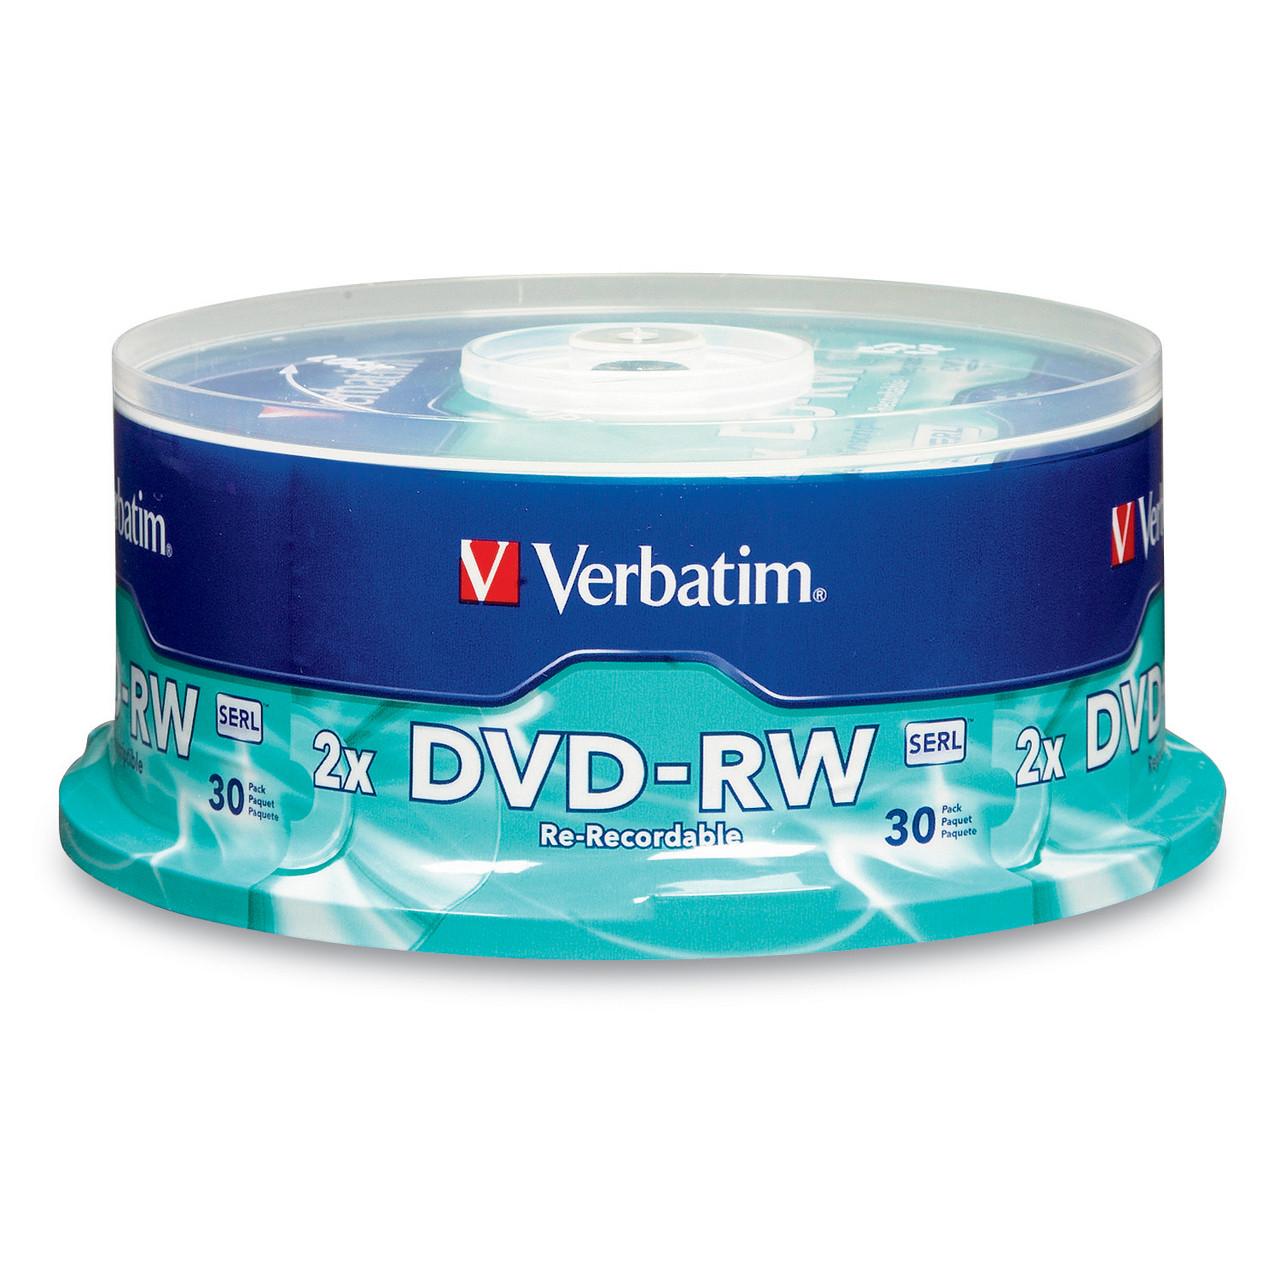 Verbatim DVD-RW - 4.7GB 2X Spindle (6 Pack of 30 Pieces)